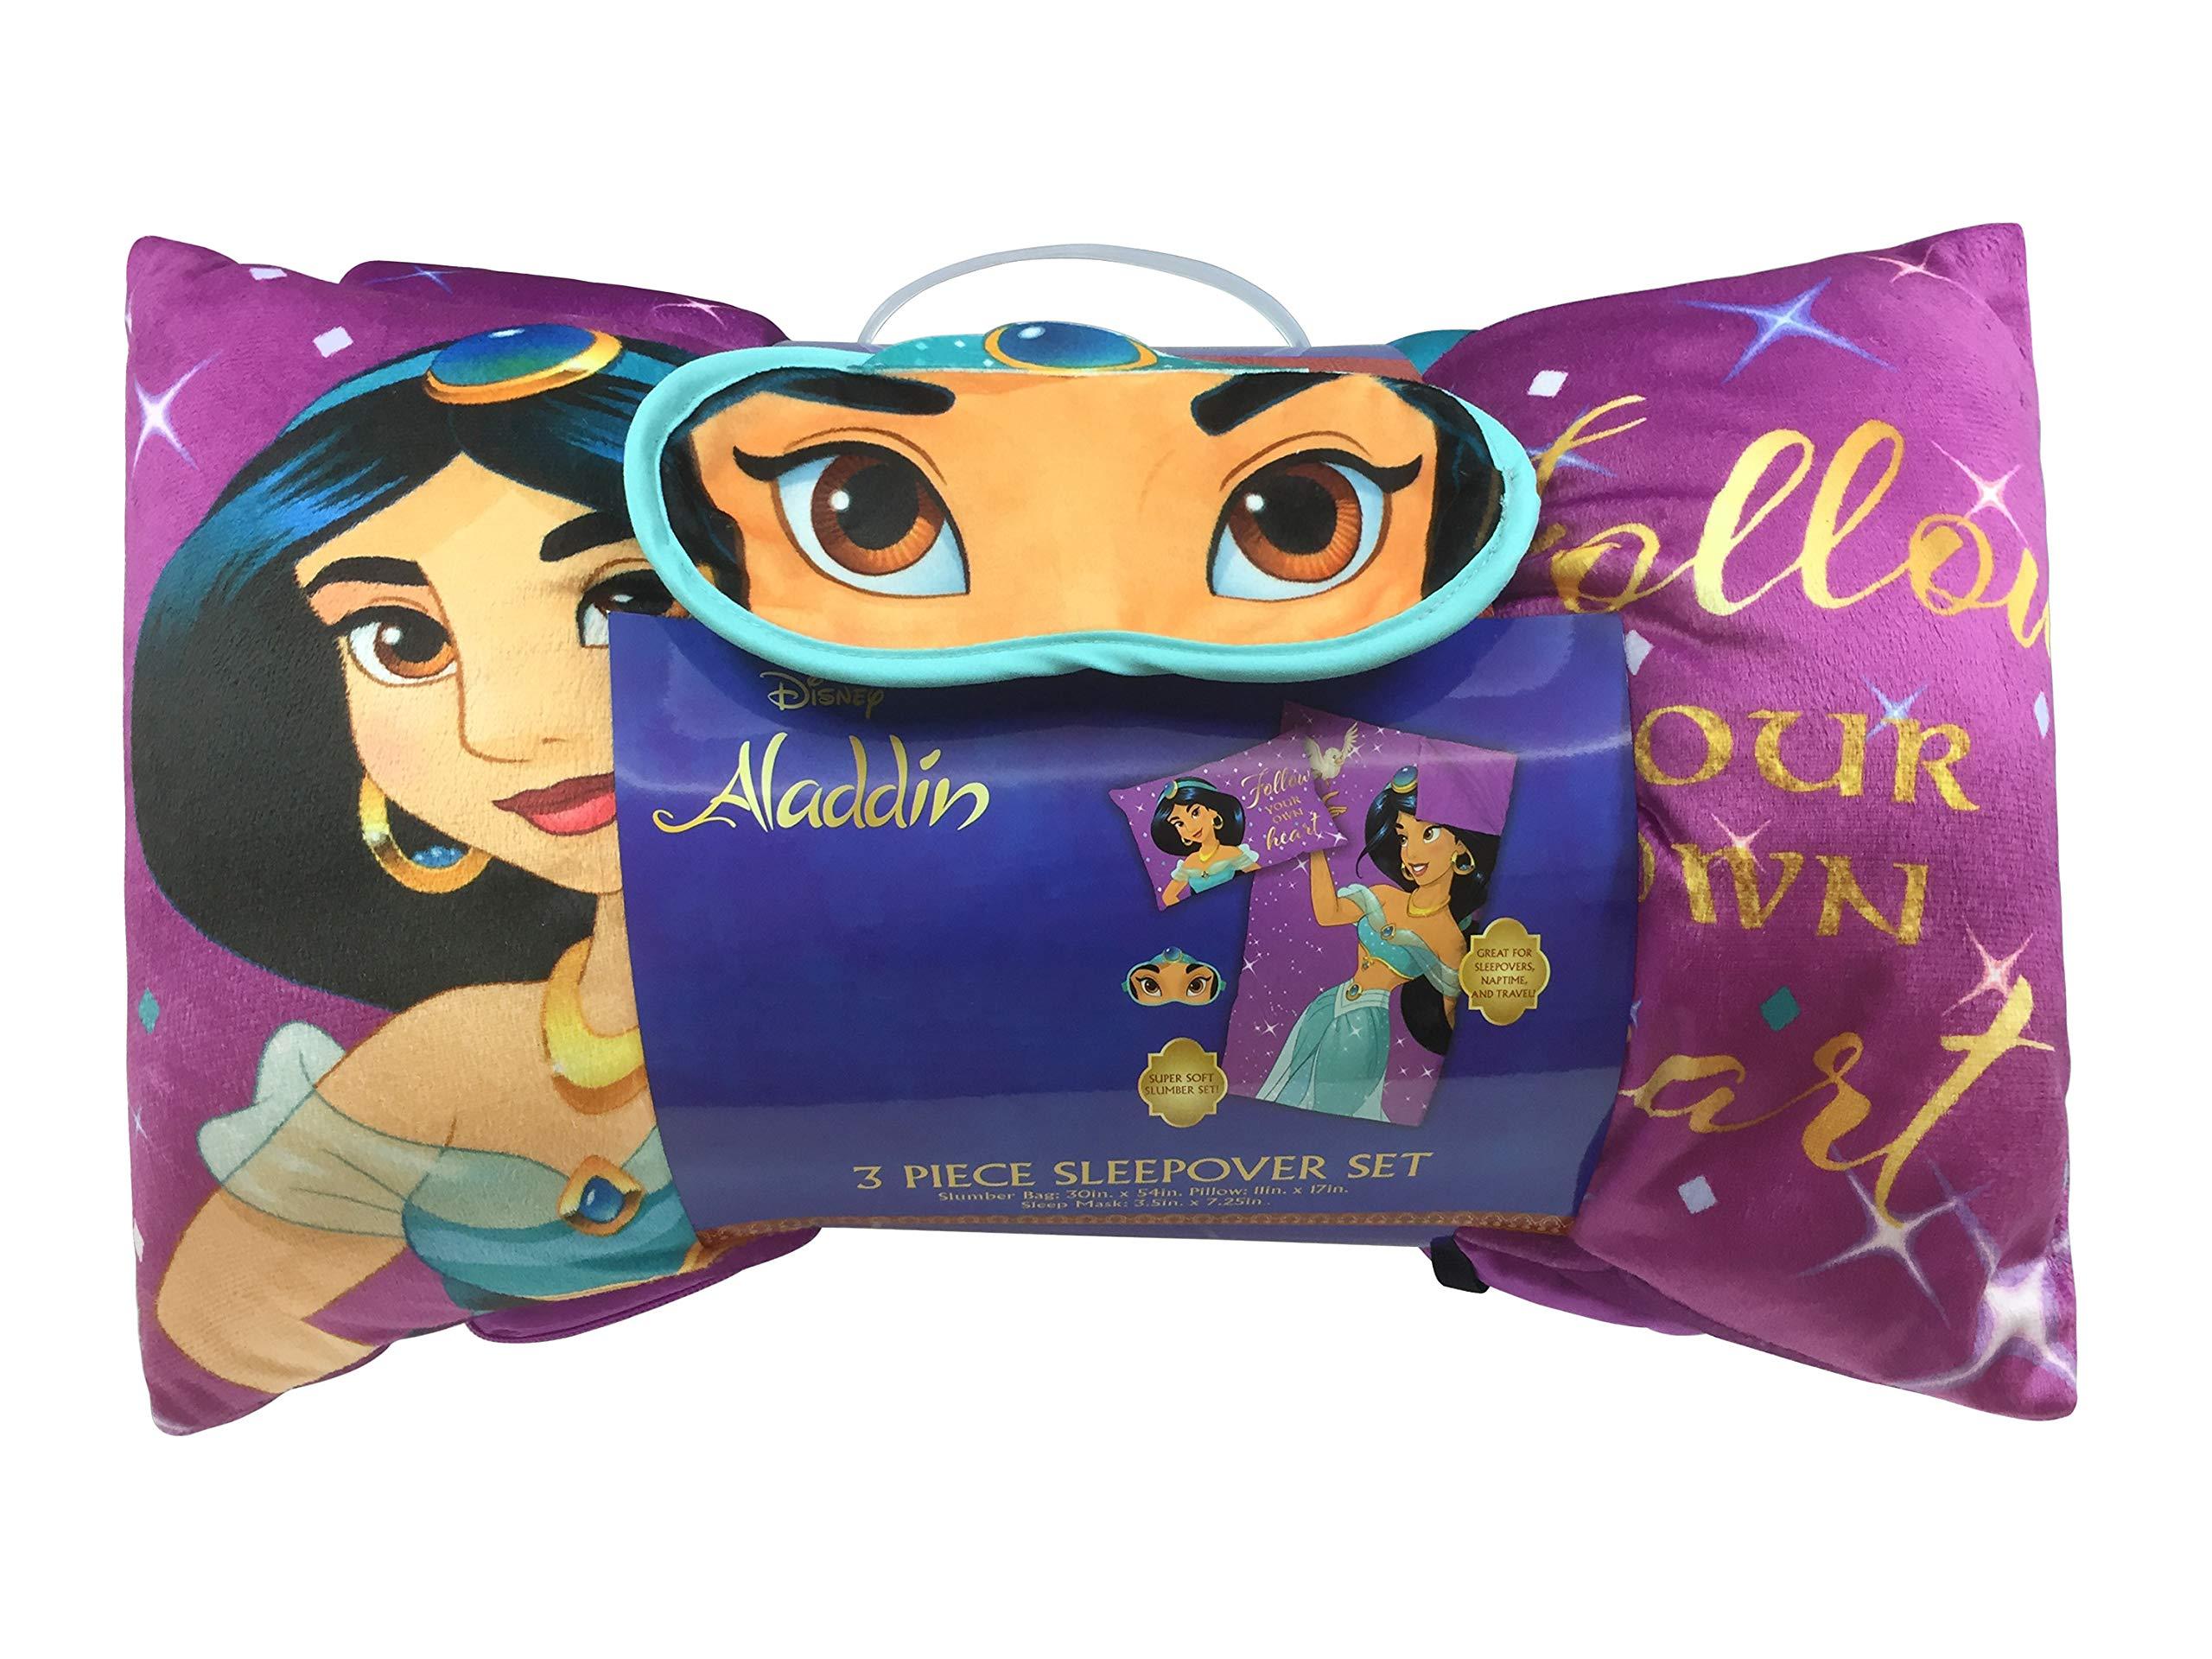 Jay Franco Disney Aladdin Magical 3 Piece Slumber Set, Purple by Jay Franco (Image #2)